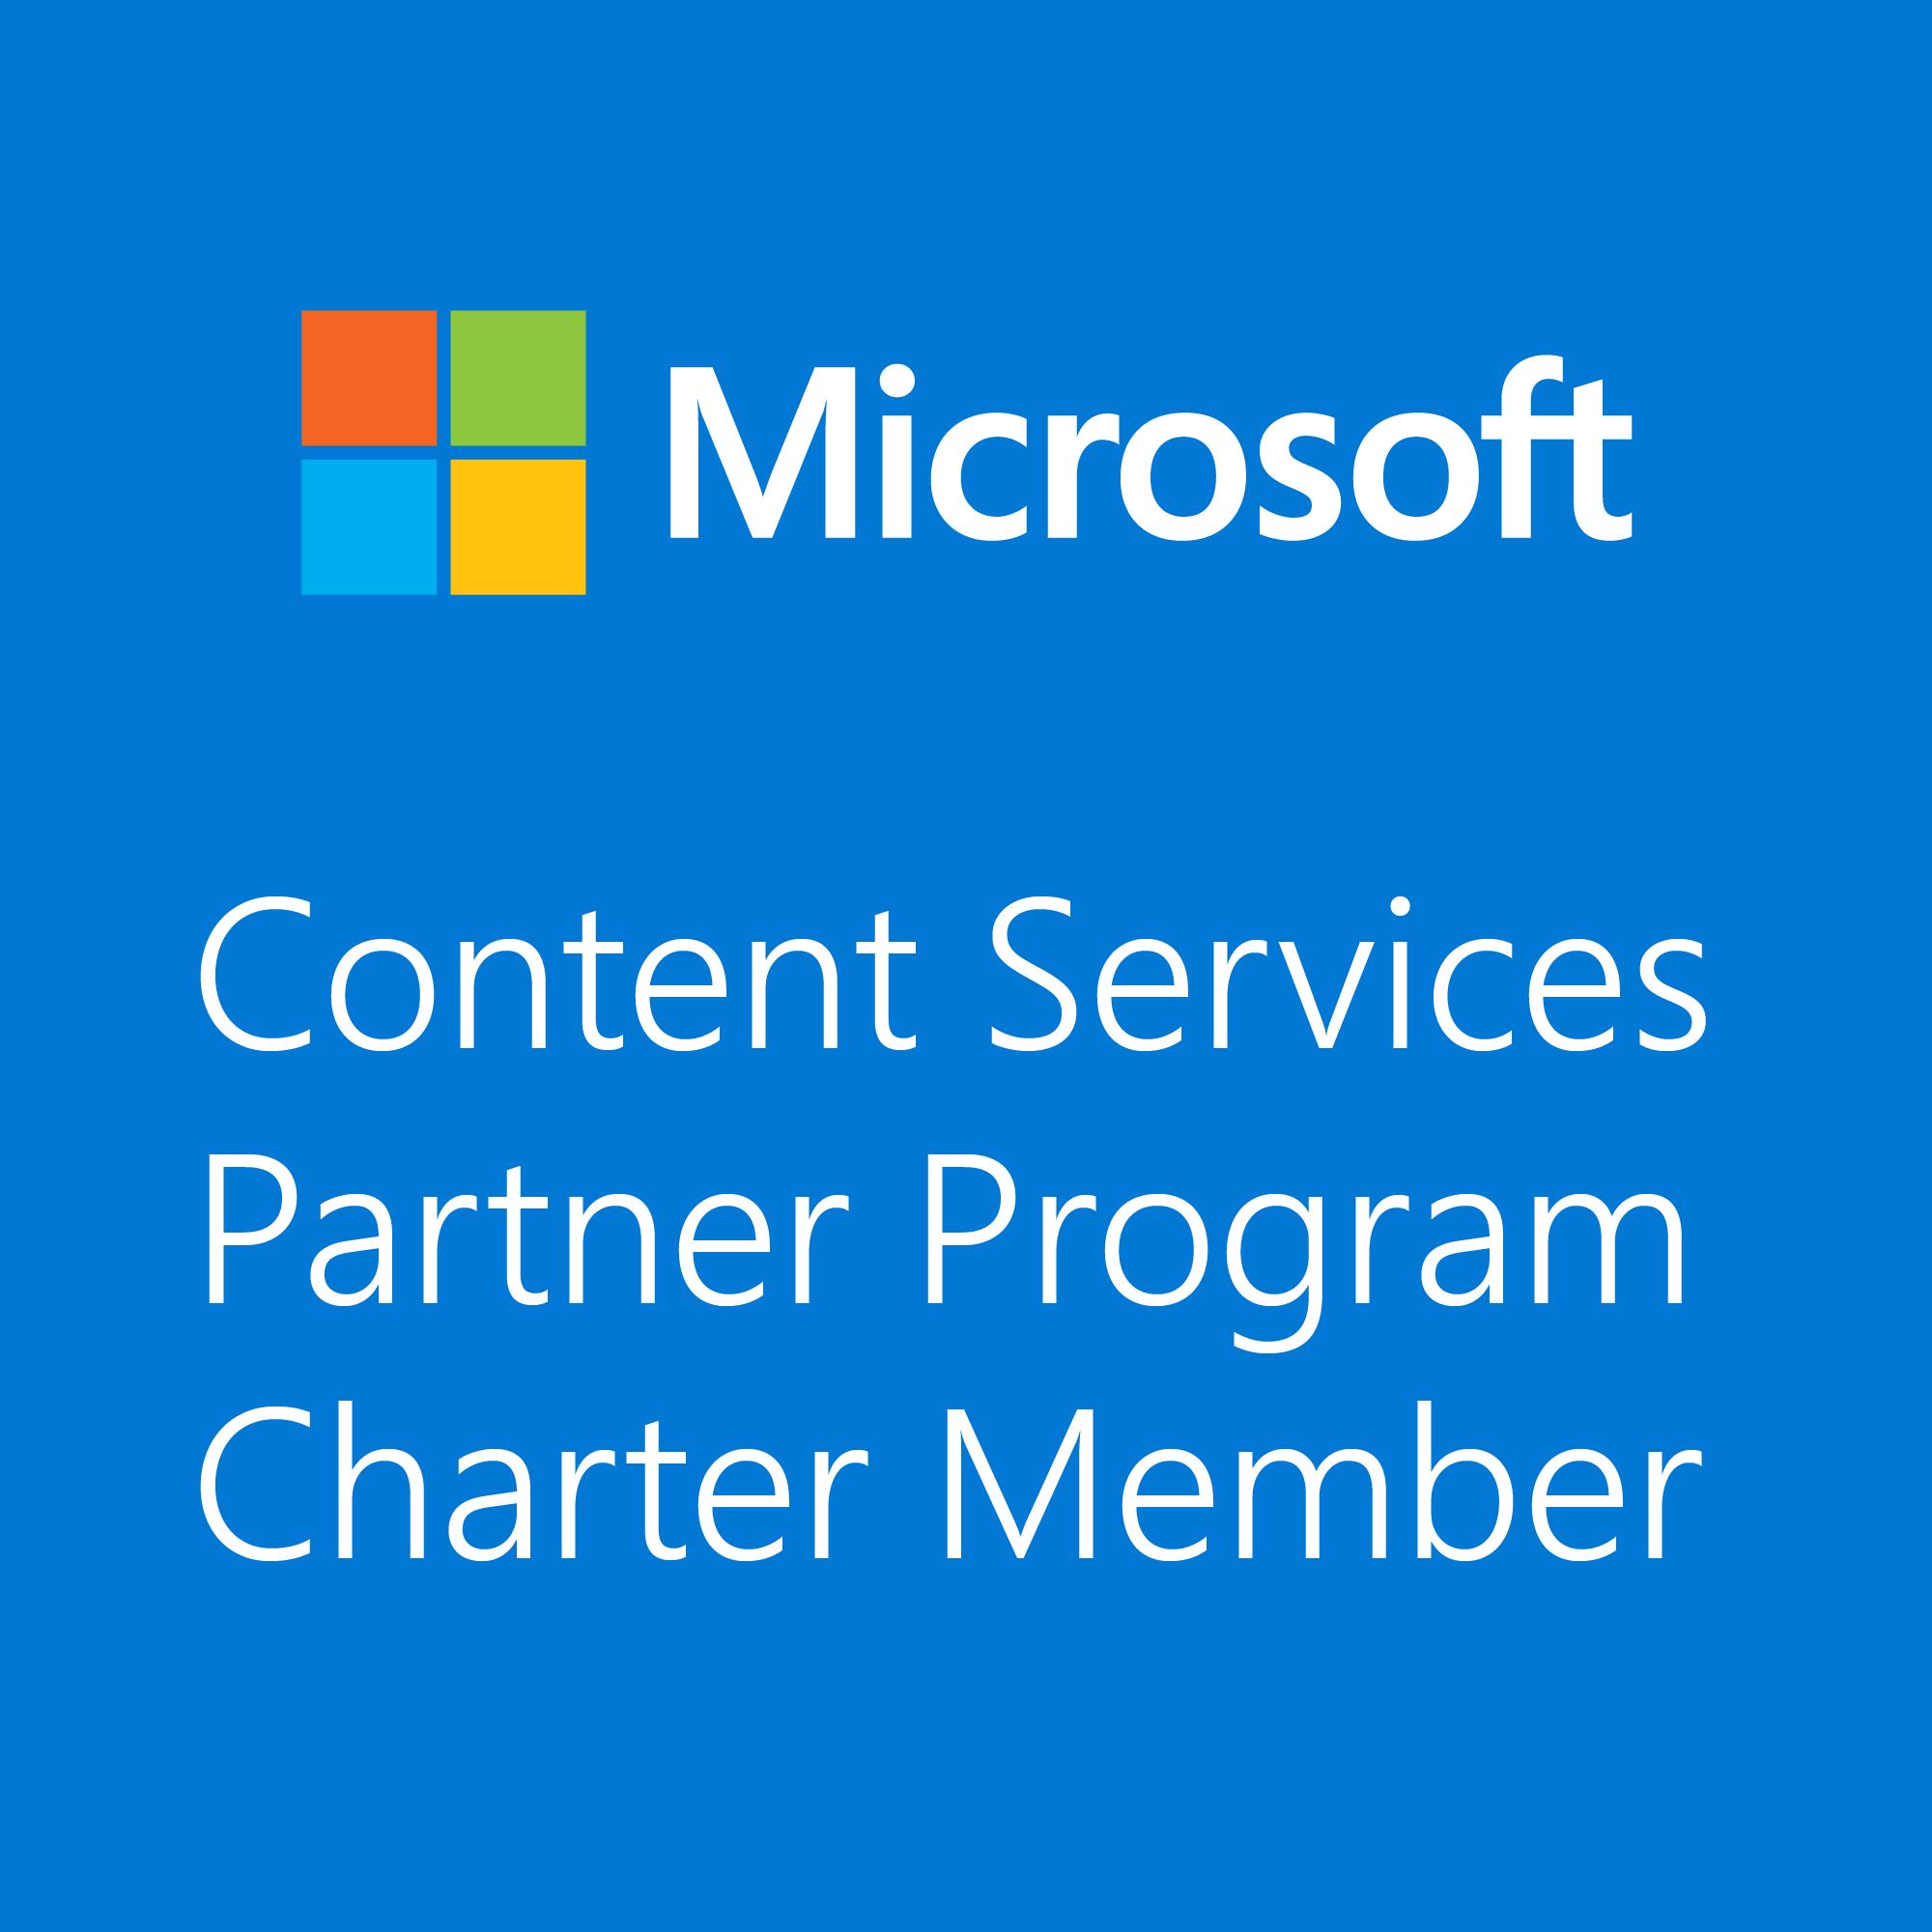 Microsoft Content Serv Charter Member